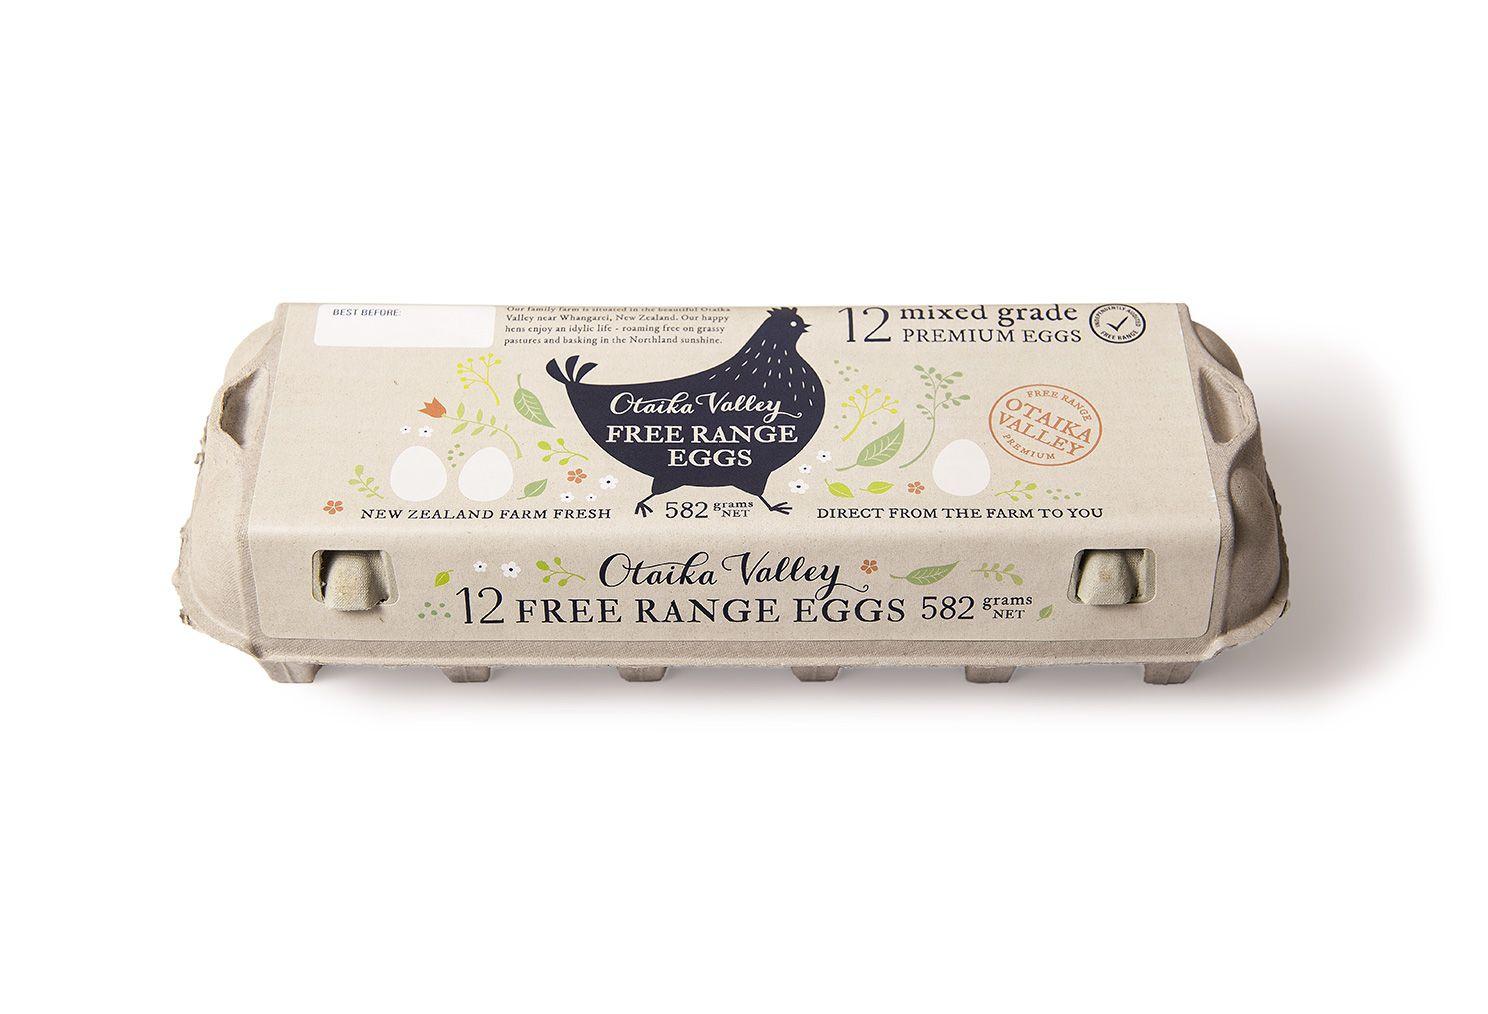 Download Egg Carton Labels Web Design Branding Dessein Egg Packaging Egg Carton Packaging Inspiration